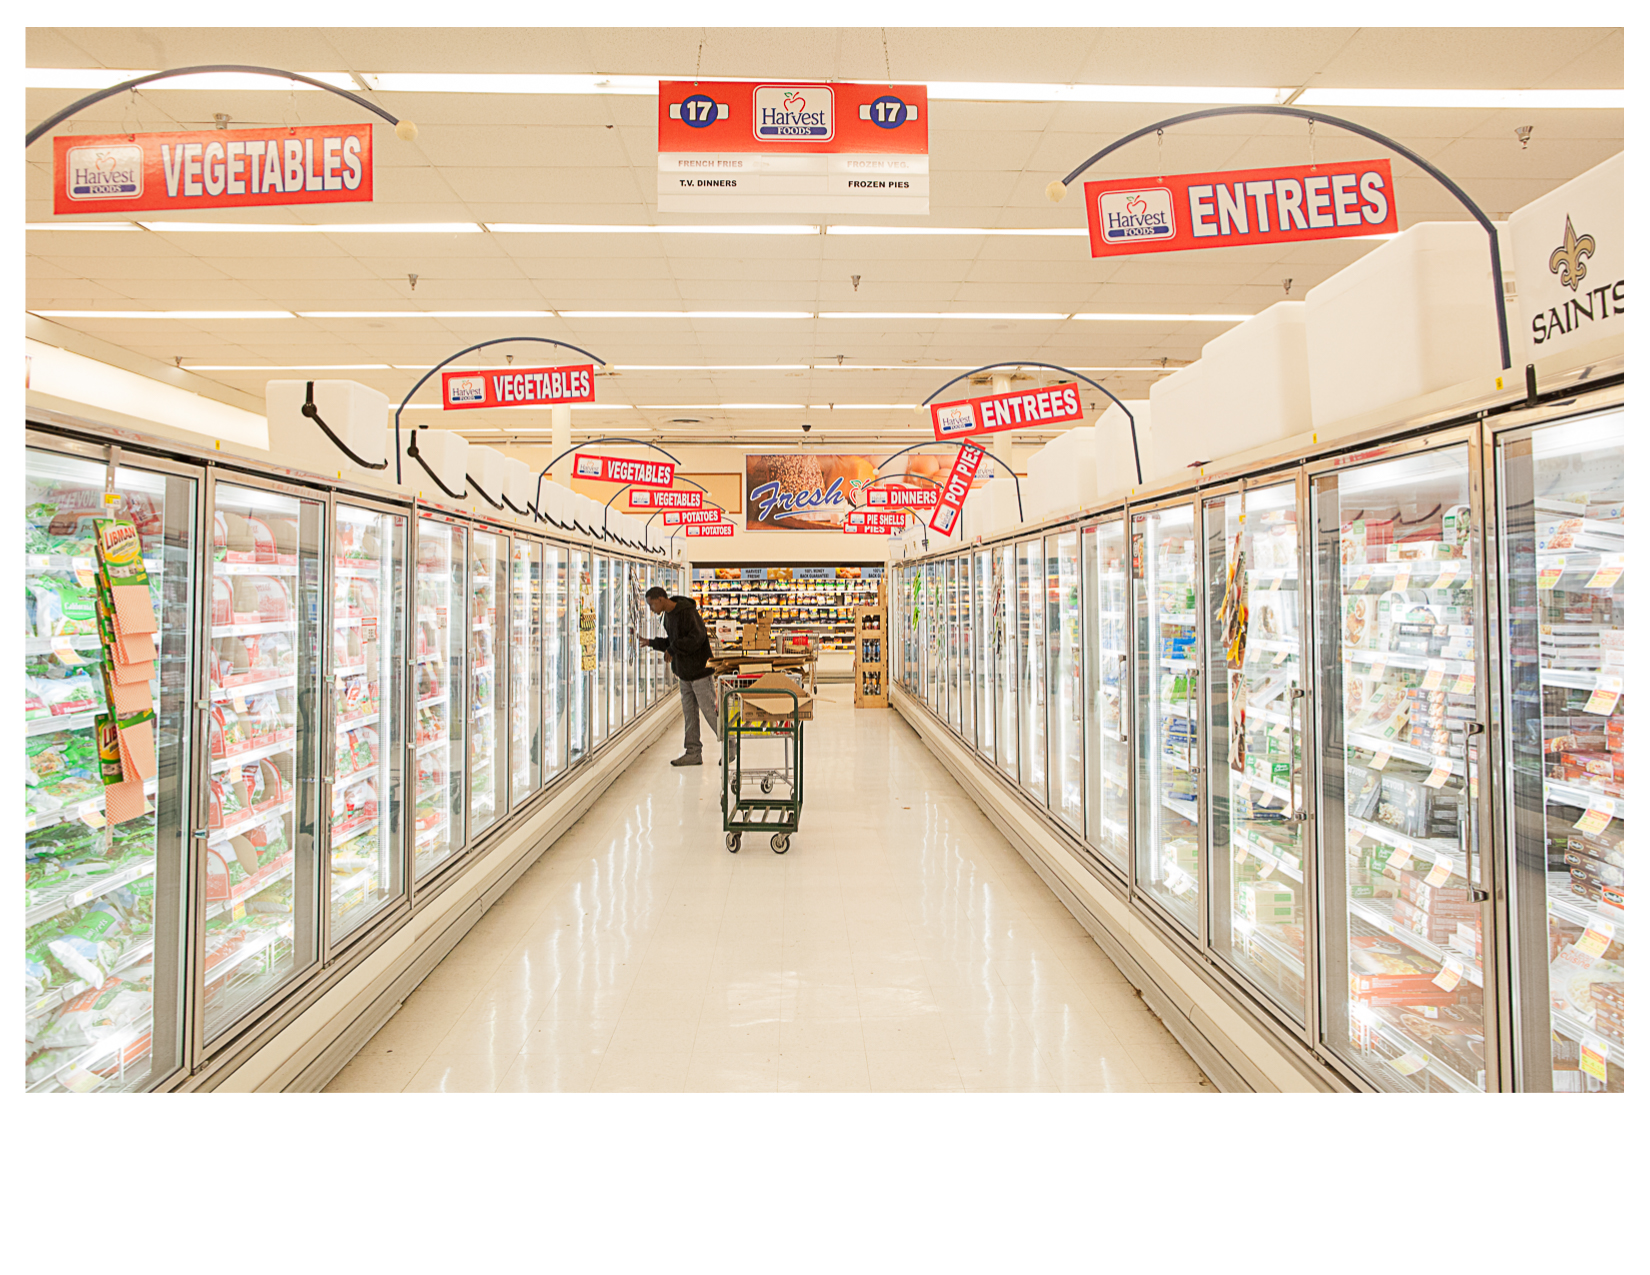 Frozen Food Aisle, Harvest Foods Supermarket, Marksville, LA